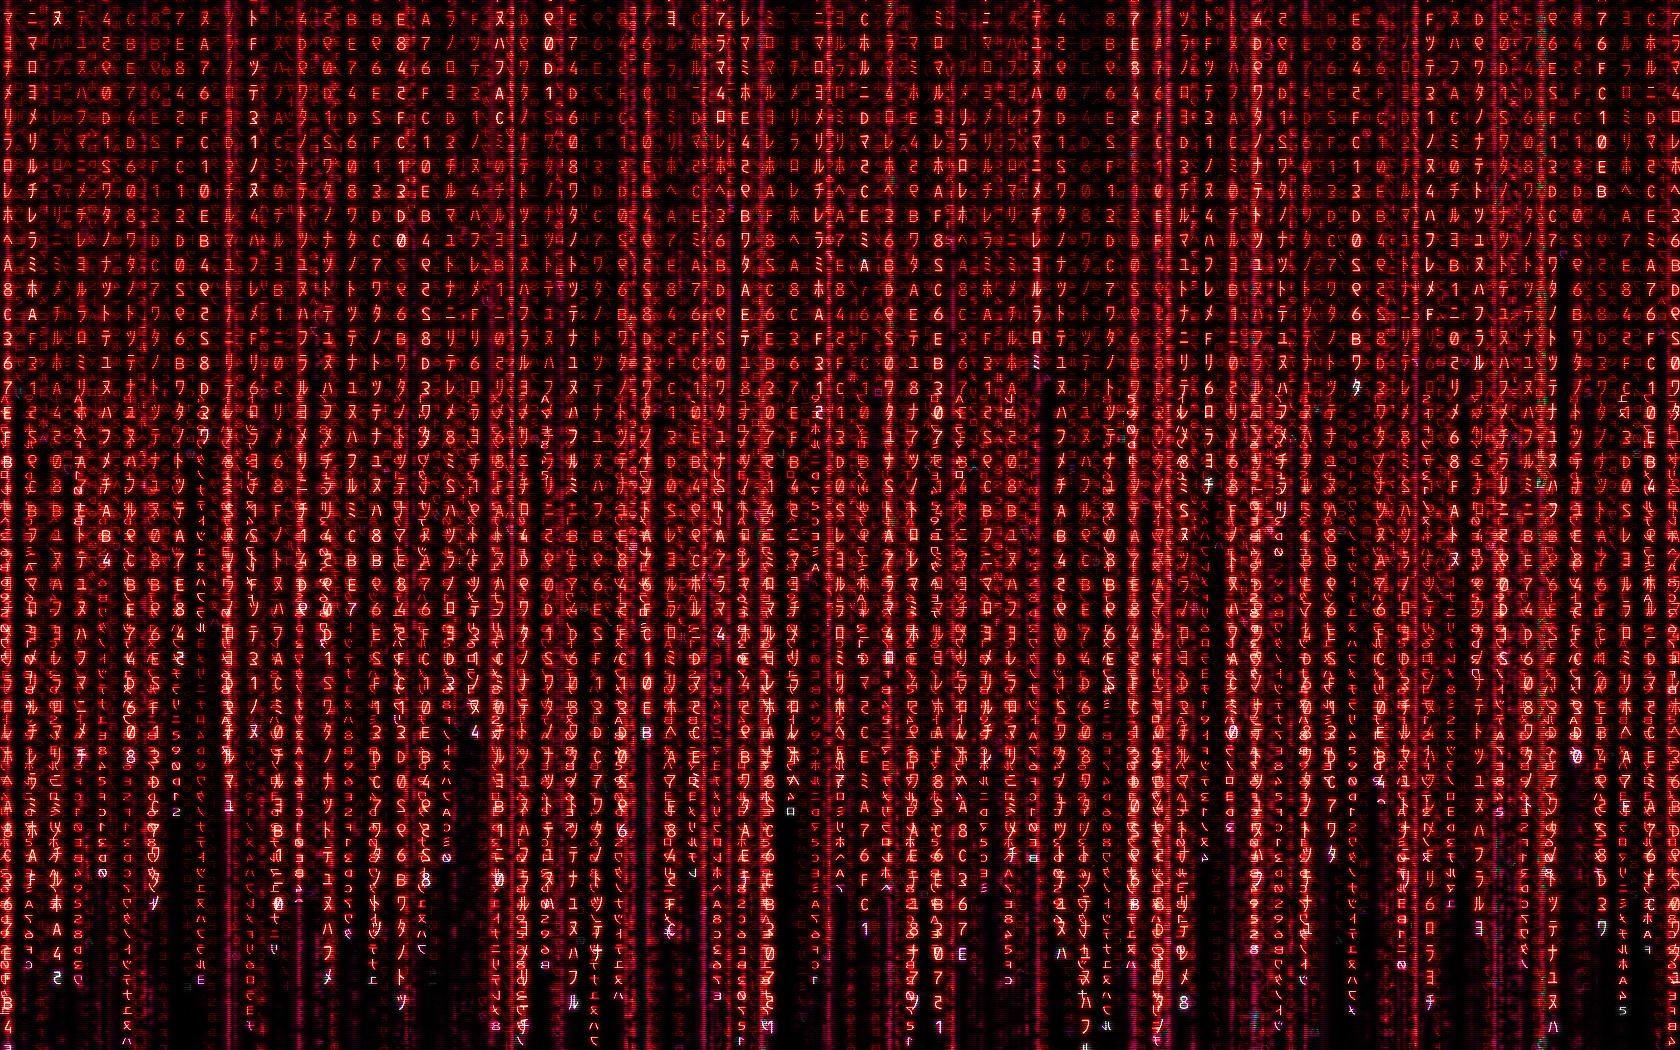 Wallpaper The Matrix code red movies 1680x1050